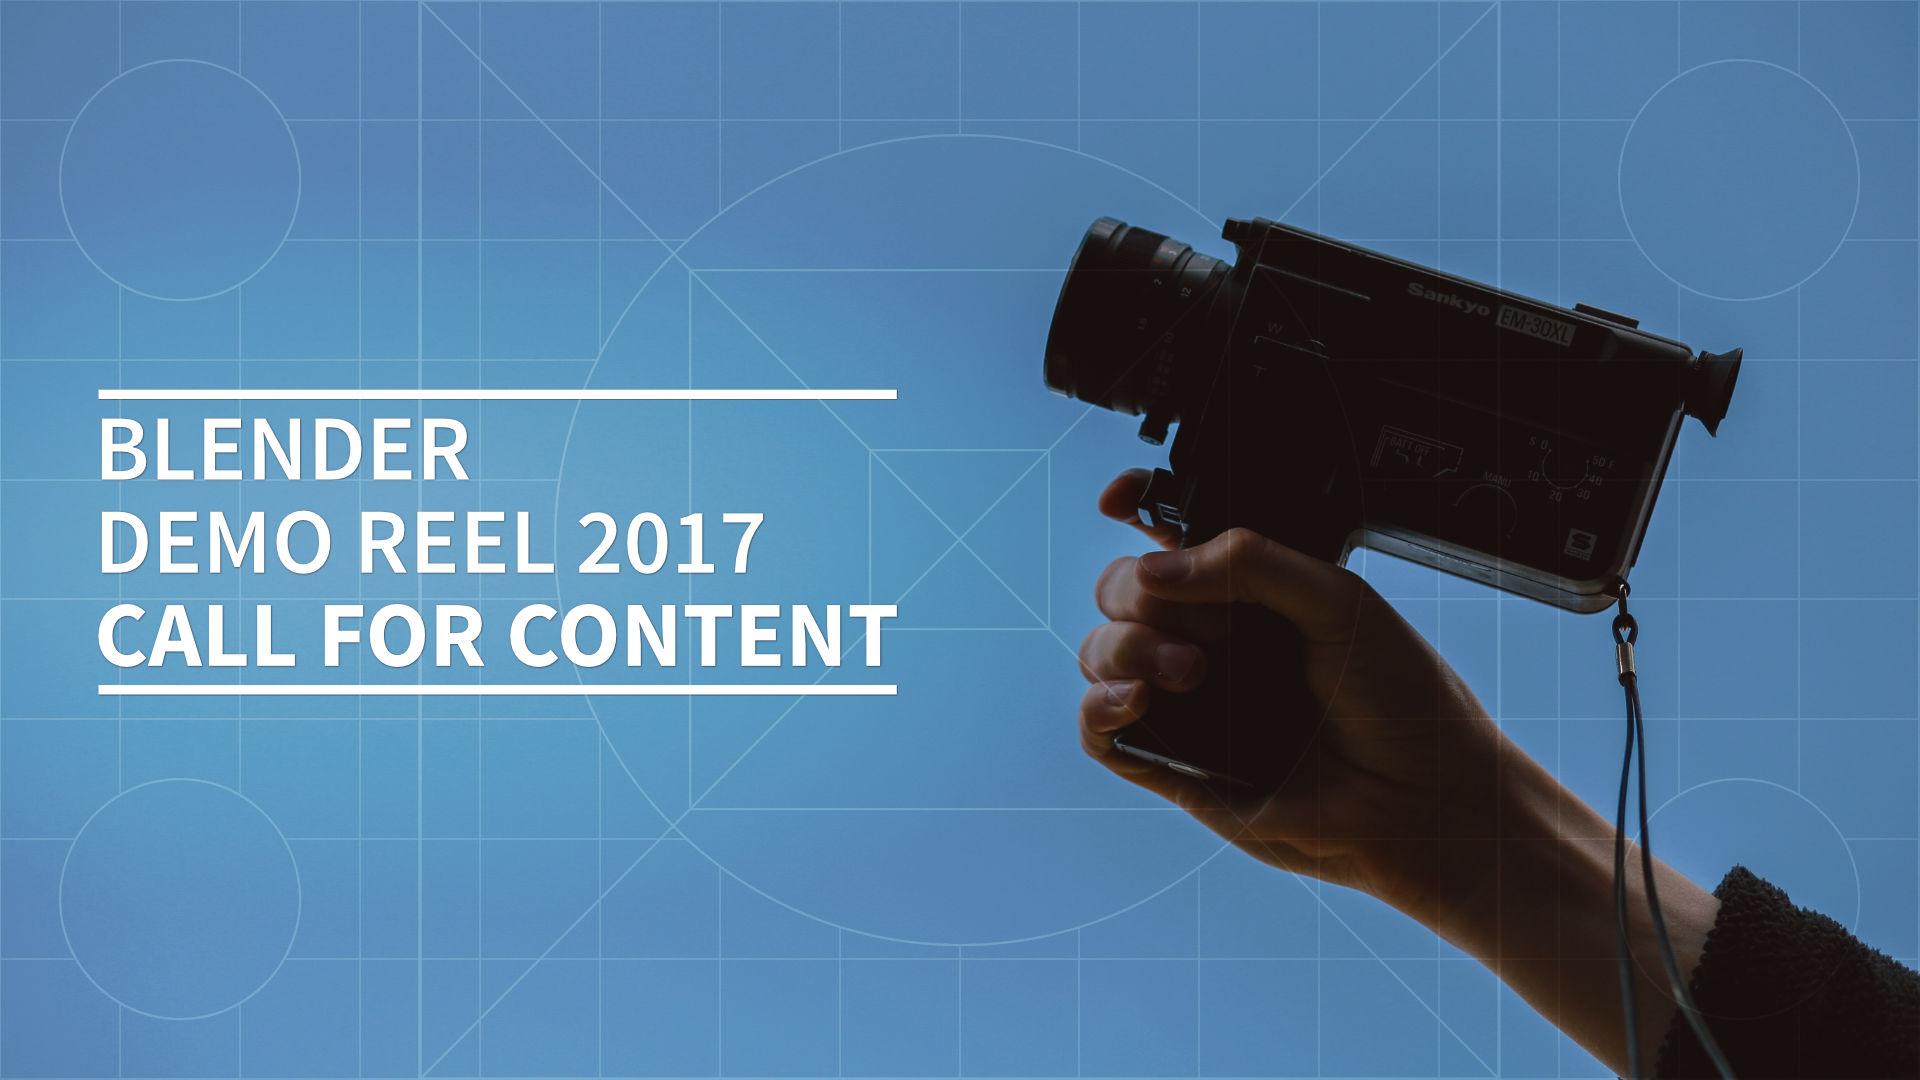 Blender Demo Reel 2017 call for content